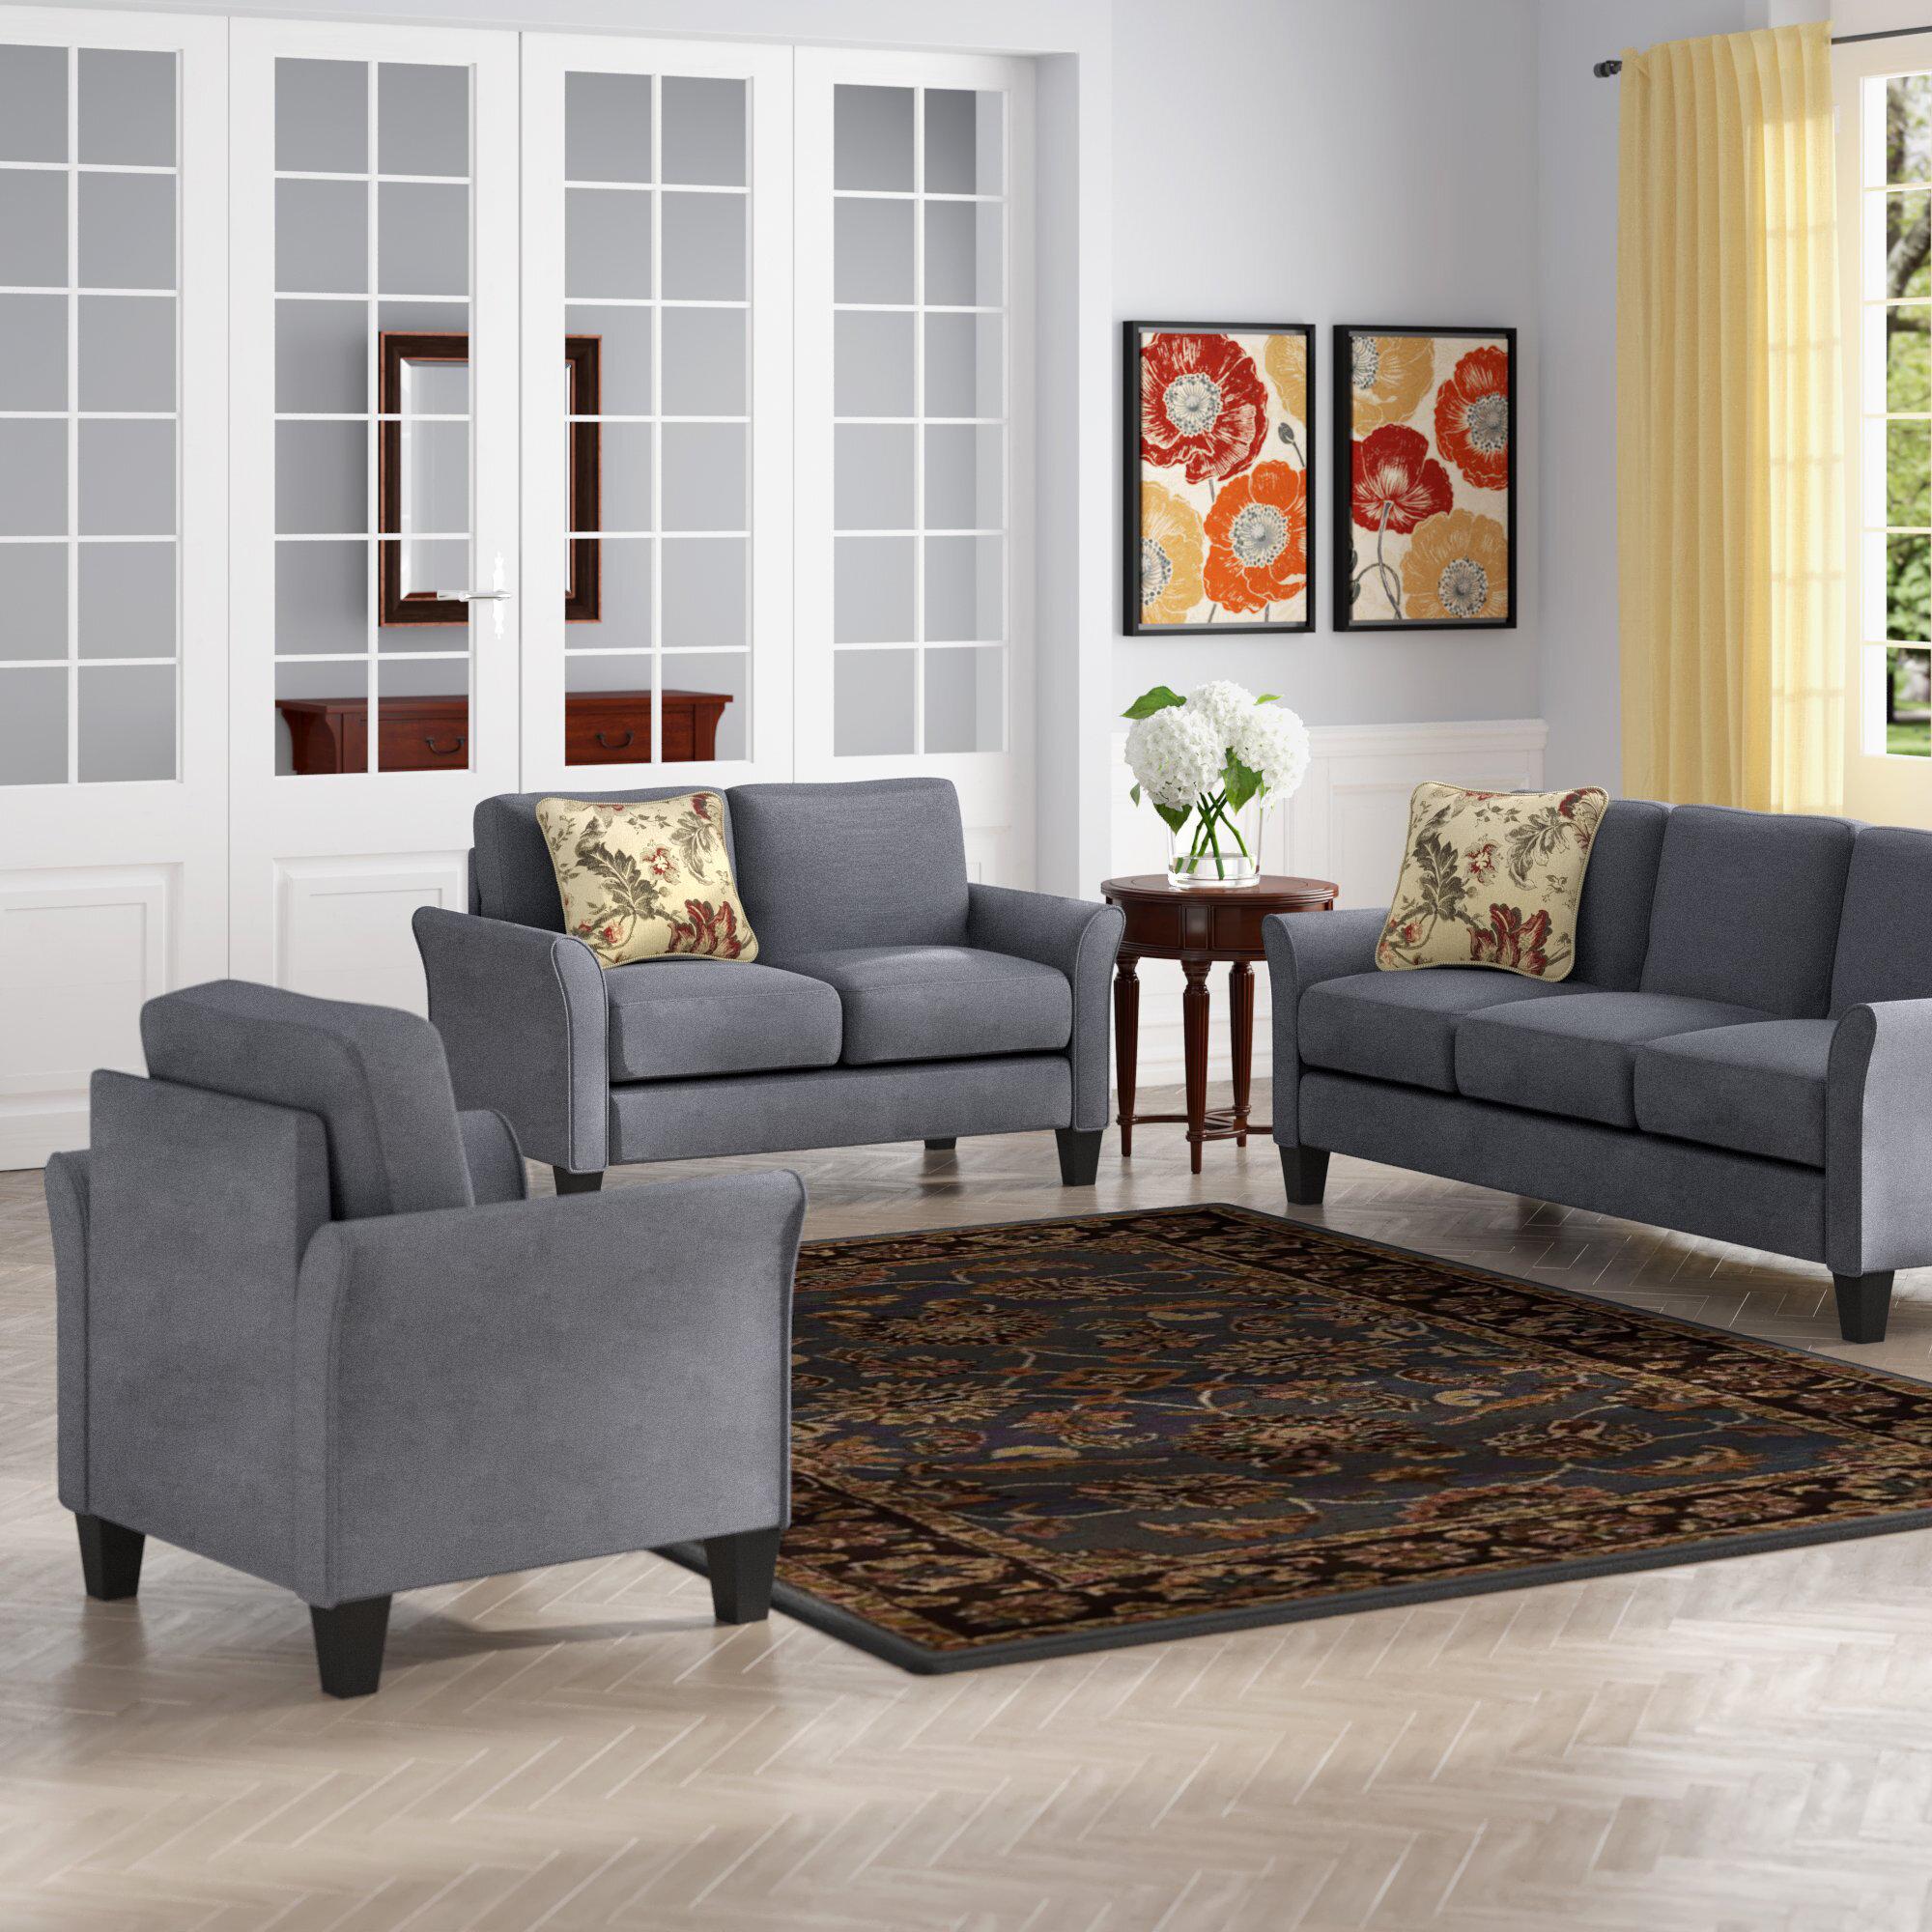 Red Barrel Studio Goldnilla 3 Piece Living Room Set Reviews Wayfair